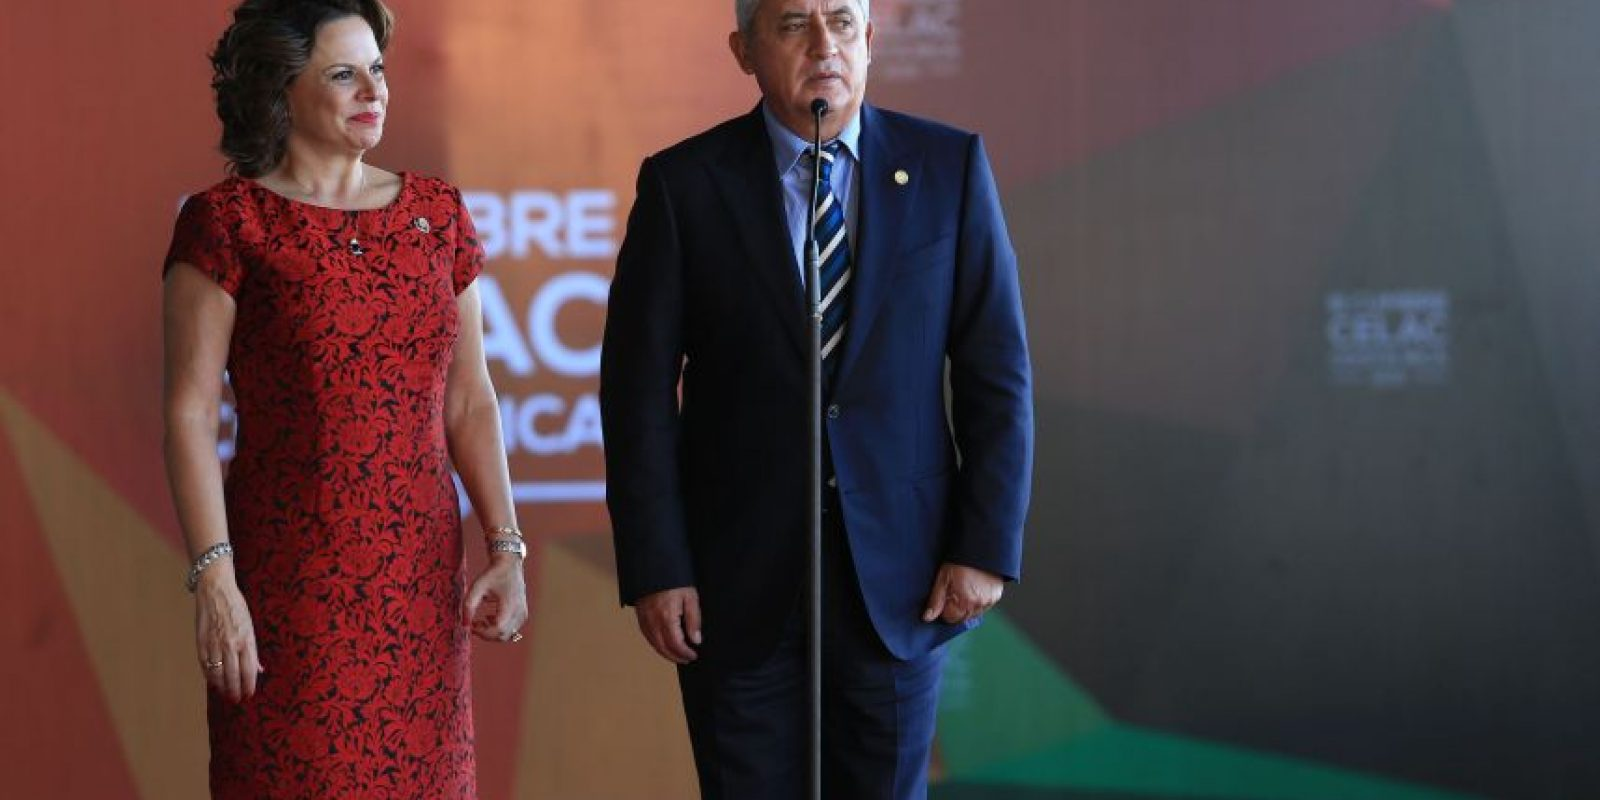 La vicepresidente costarricense, Ana Elena Chacó lo recibió.n Foto:Presidencia